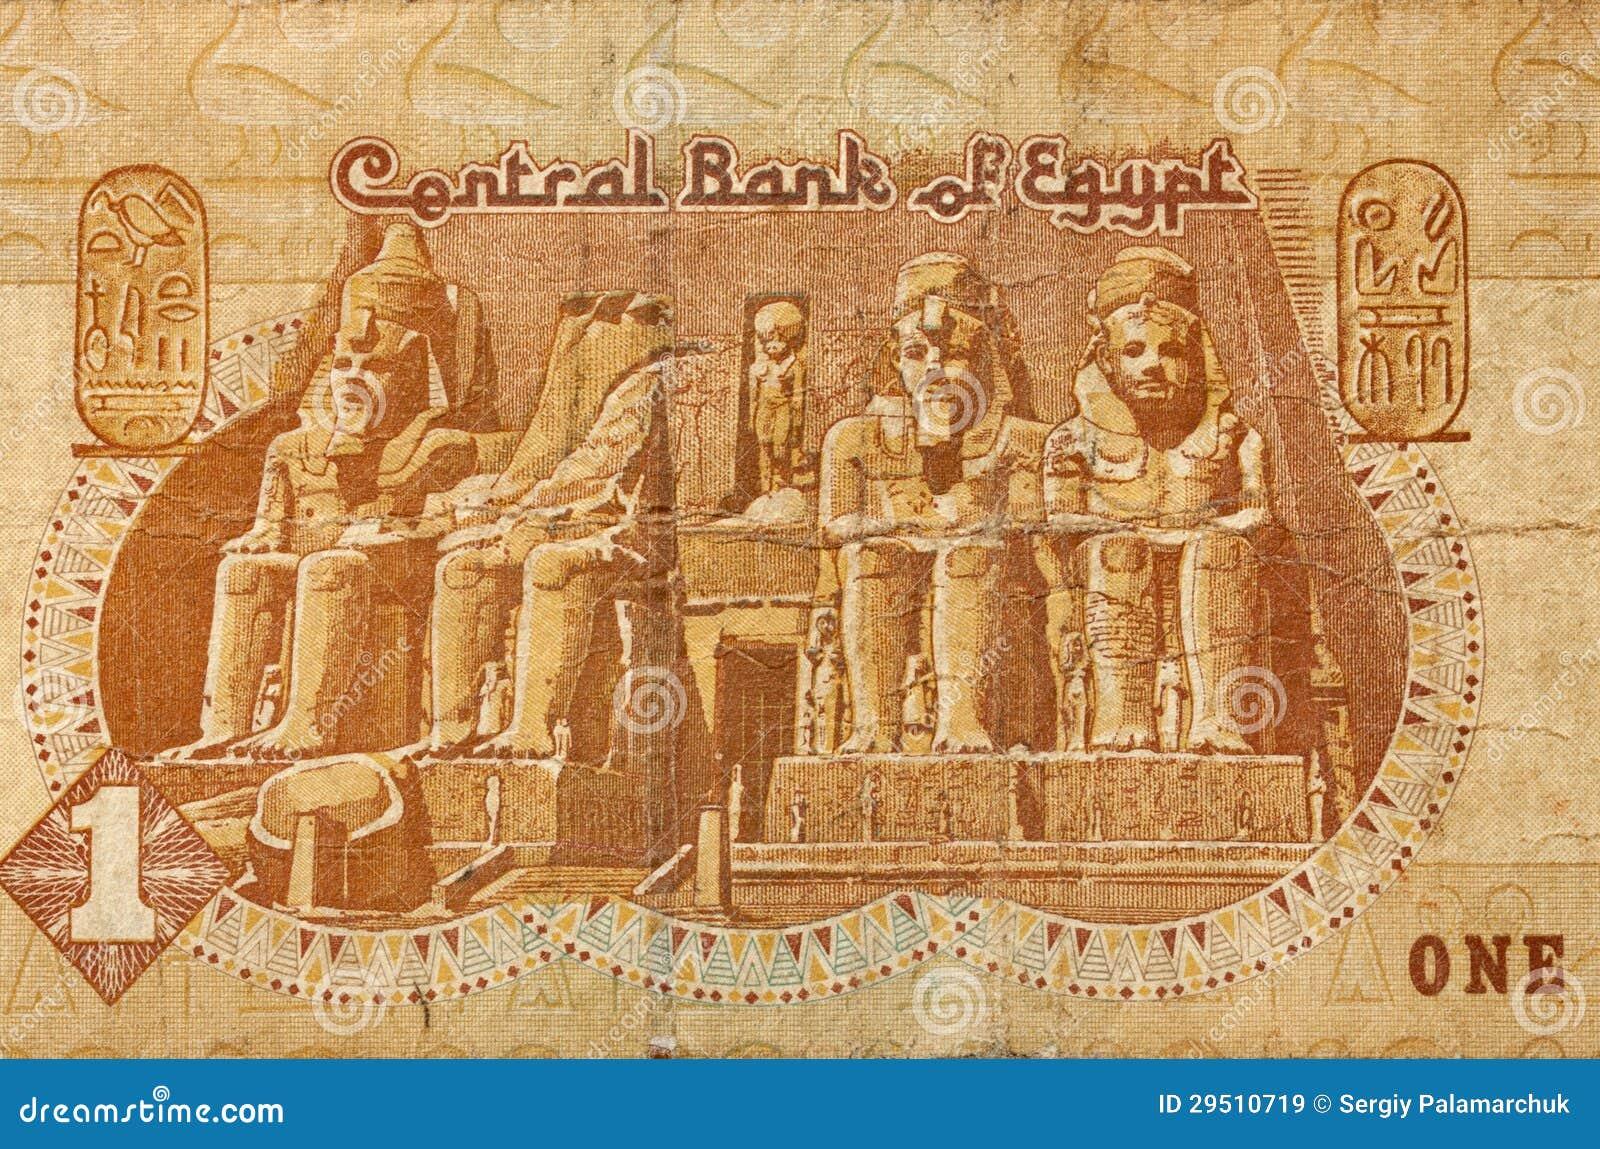 Één fragment van het het pondbankbiljet van Egypte